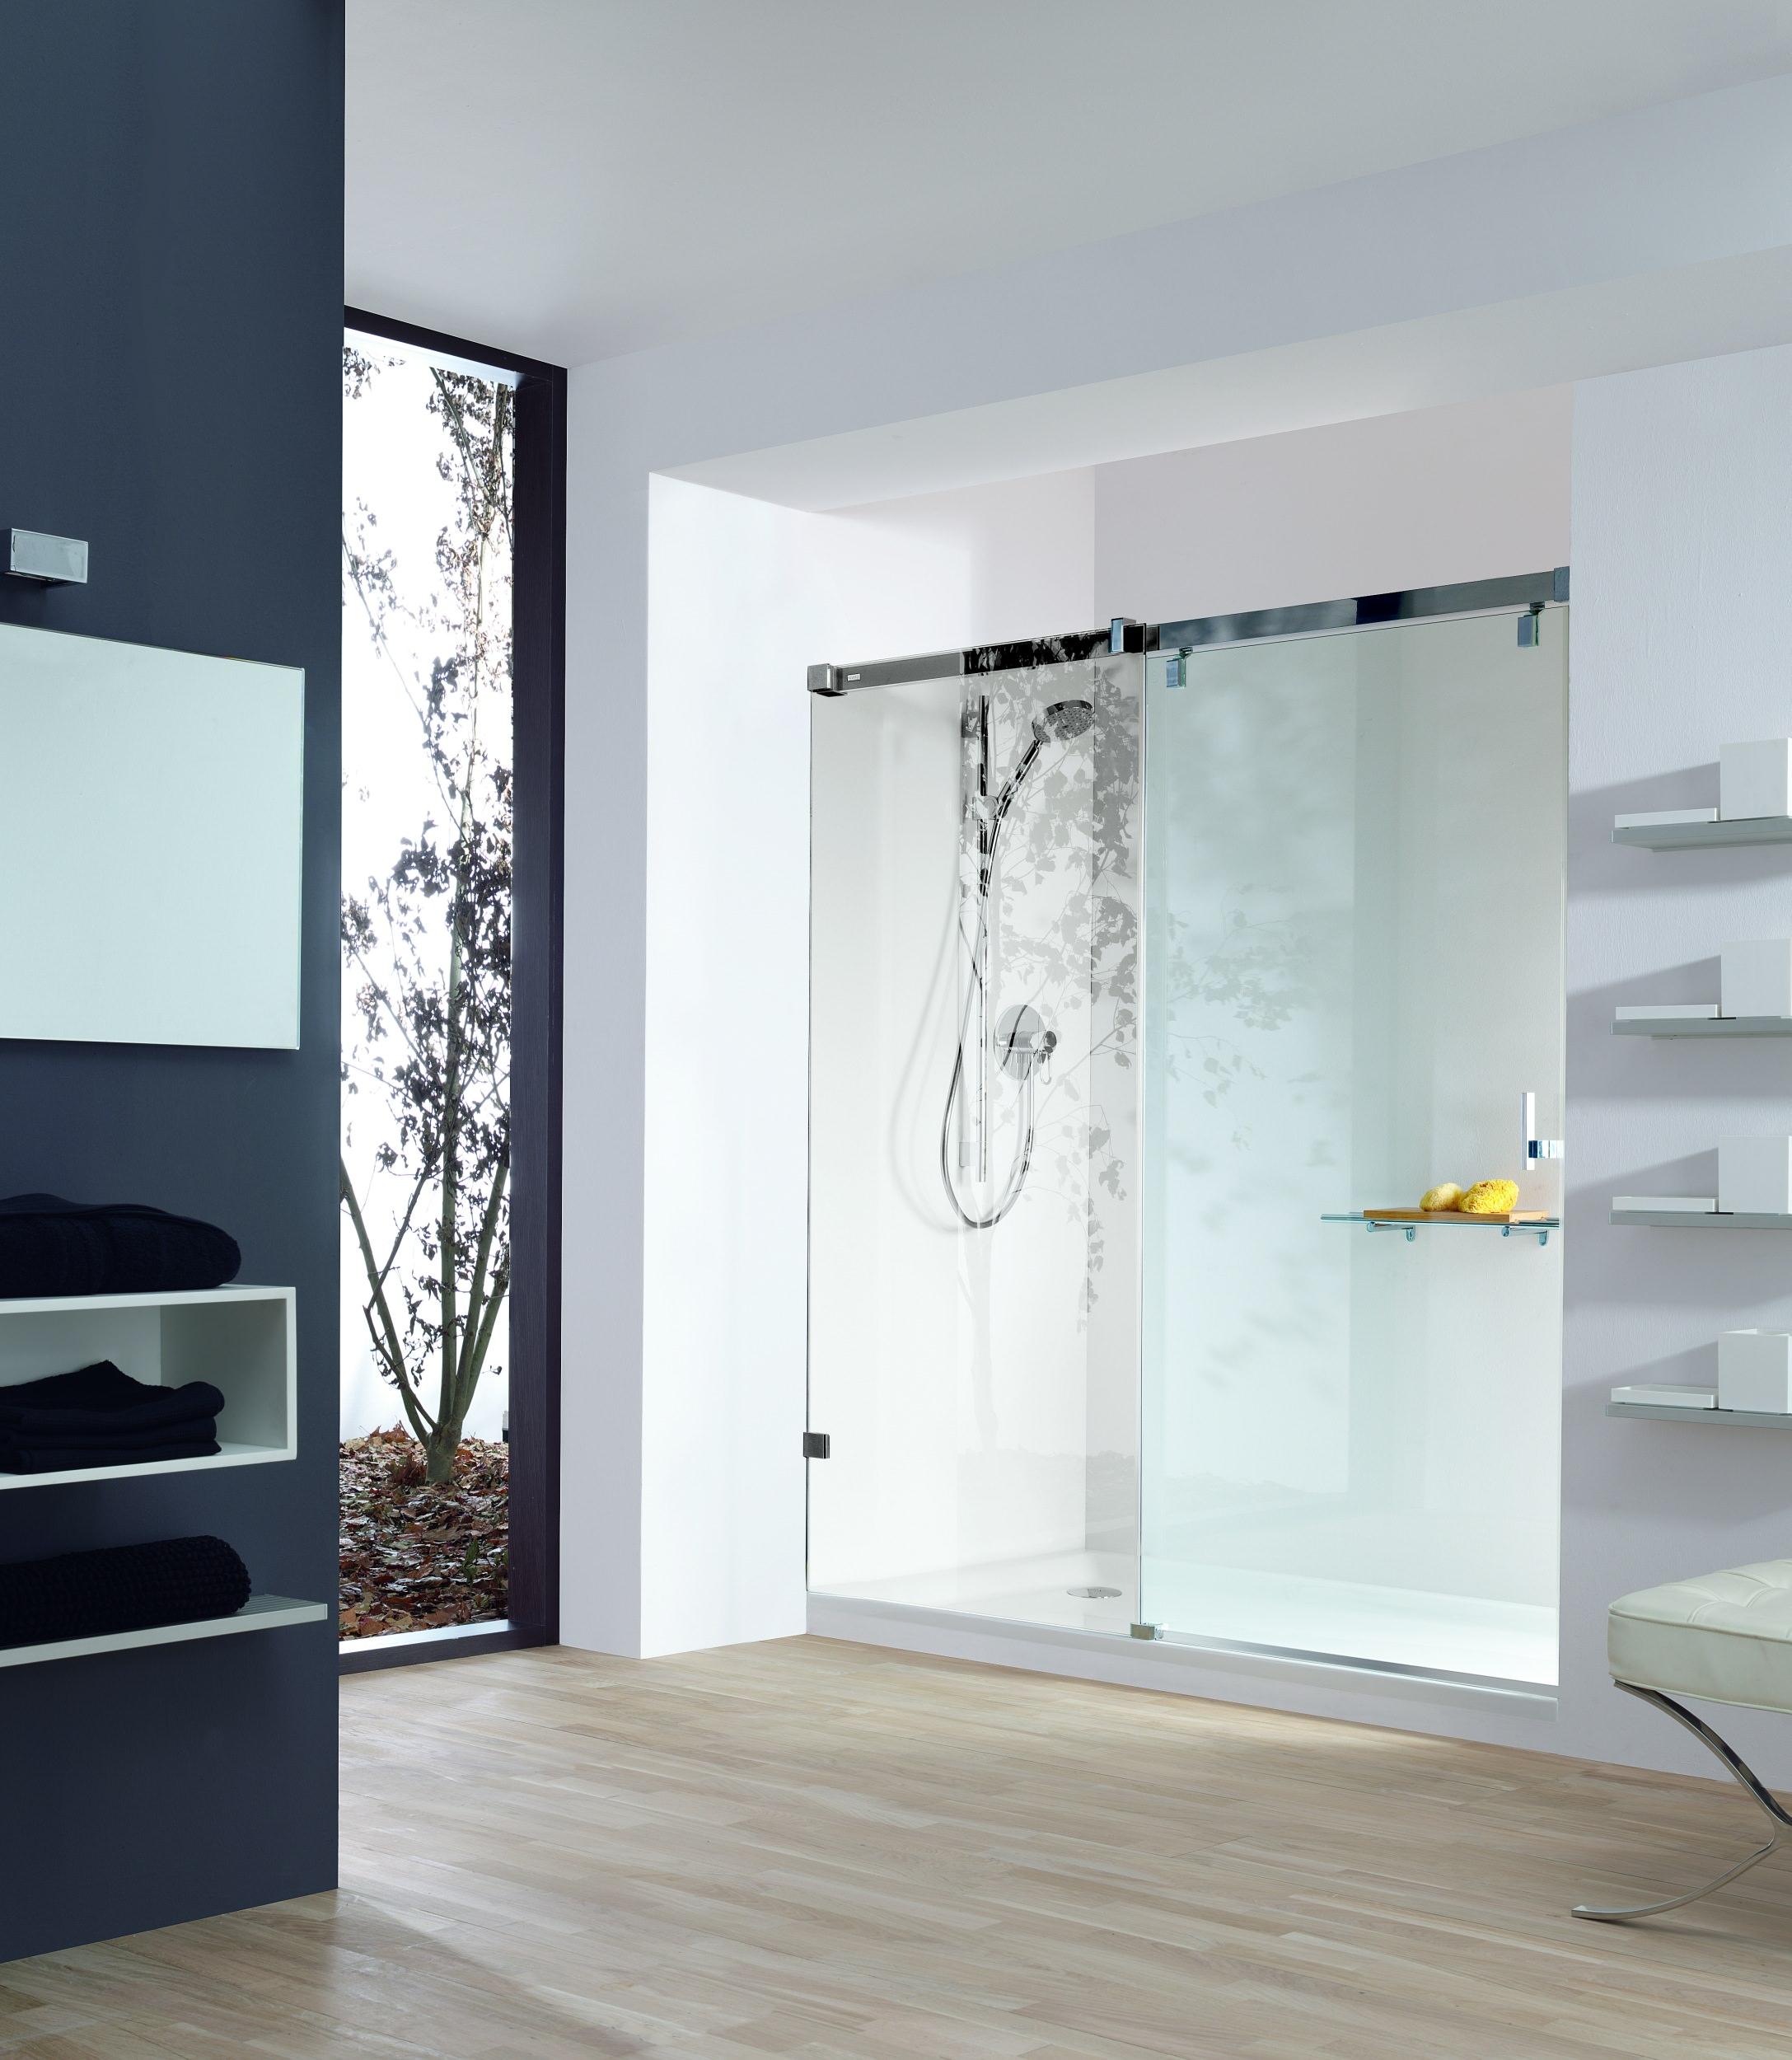 h ppe vista pure rahmenlos gleitt r 1teilig mit festem segment in nische chrom klarglas. Black Bedroom Furniture Sets. Home Design Ideas